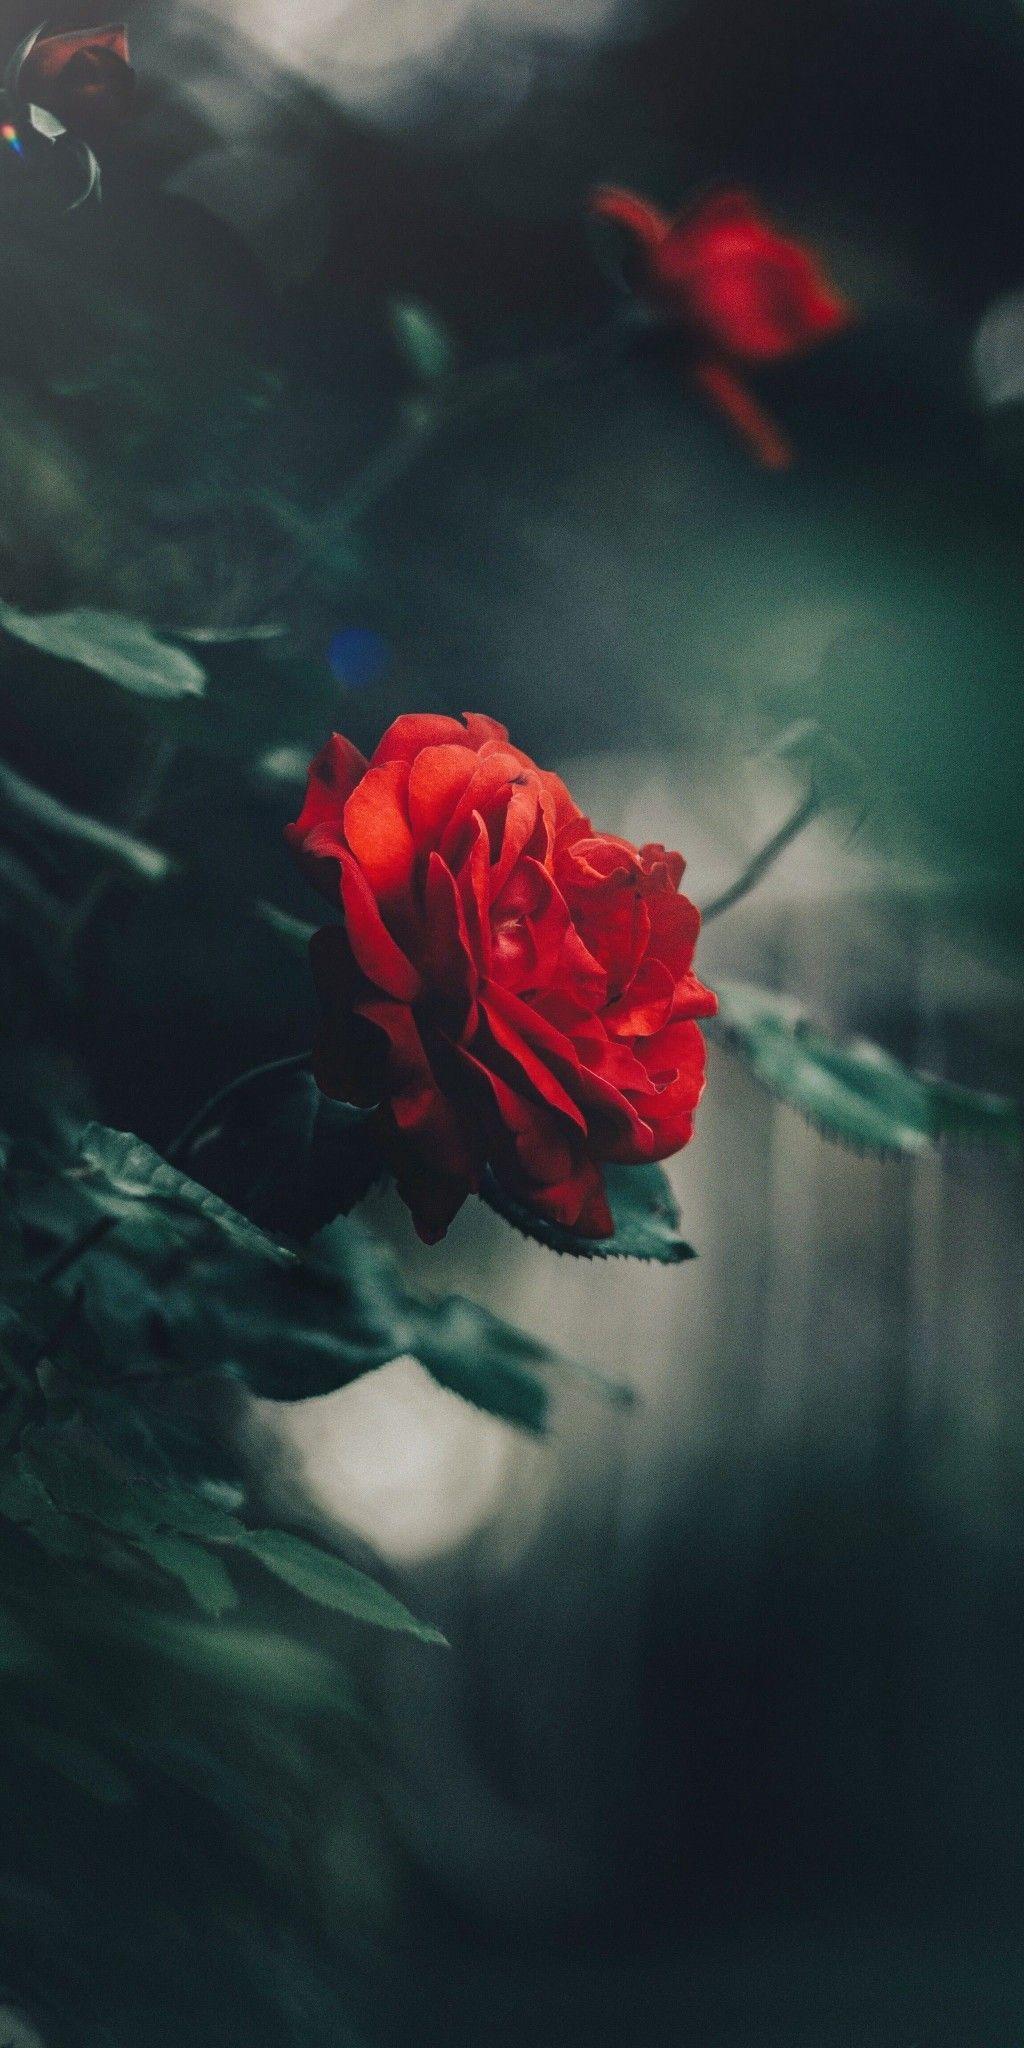 Love Rose Flower Images Free Download ...